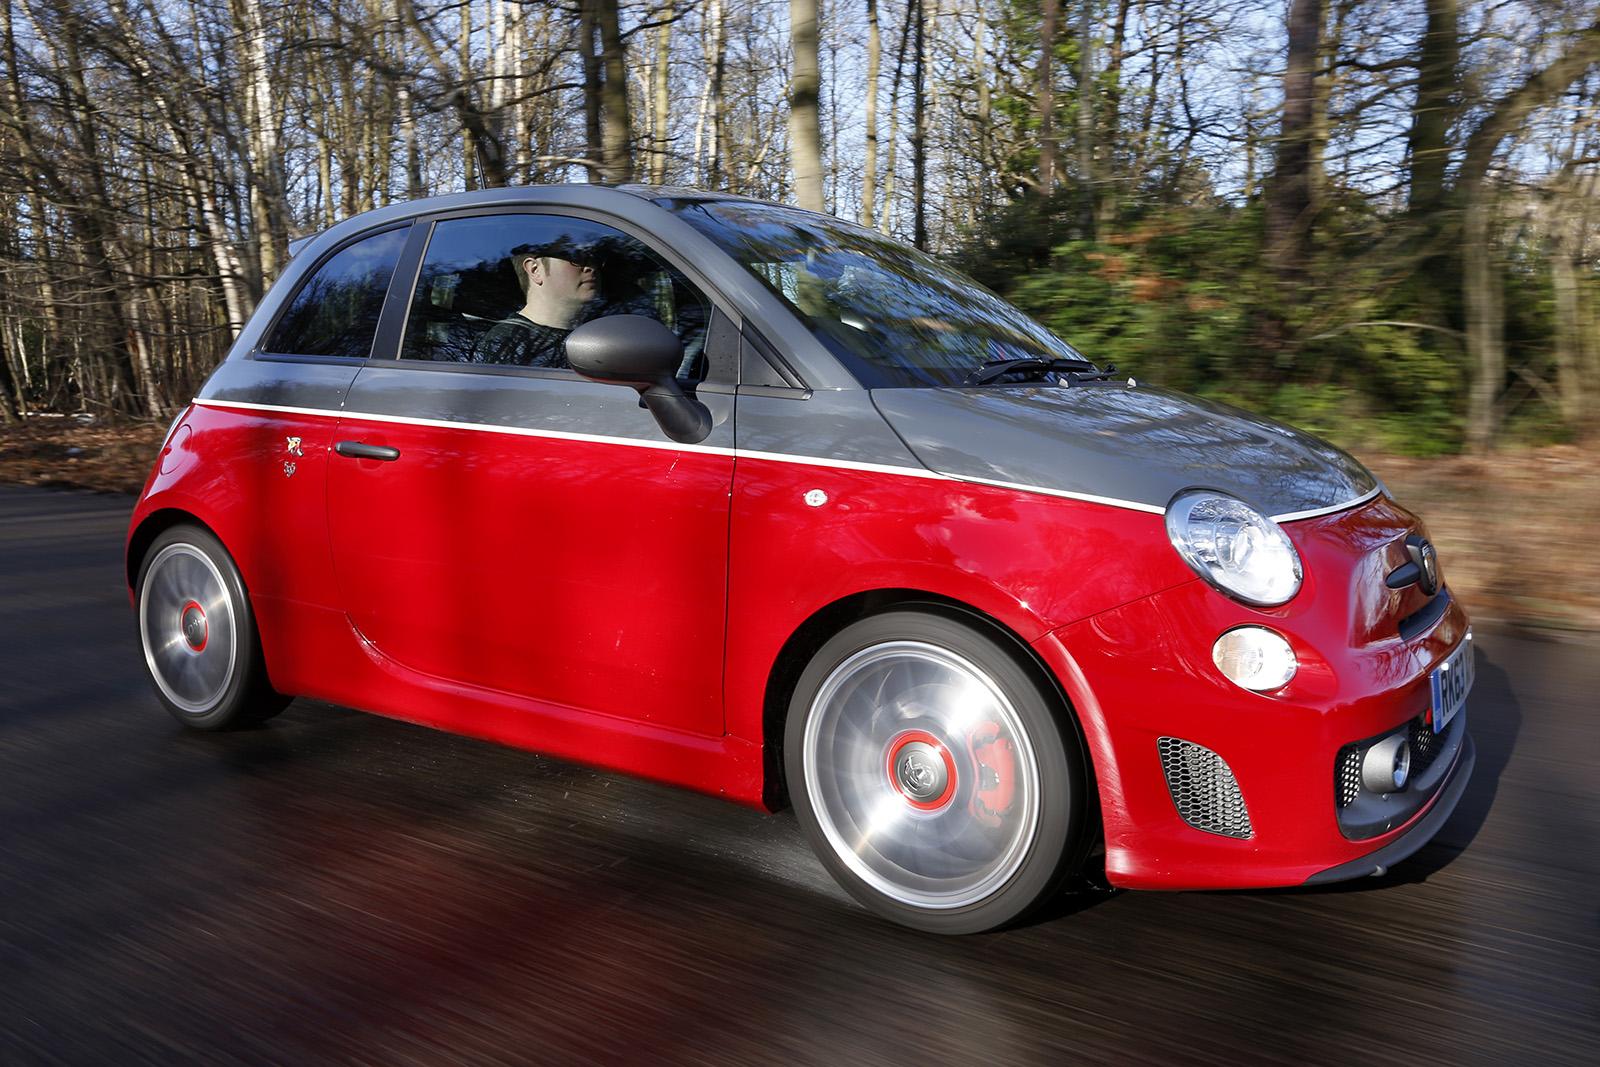 Fiat 500 Mpg >> Fiat 500 Abarth 595 Competizione Review | Autocar